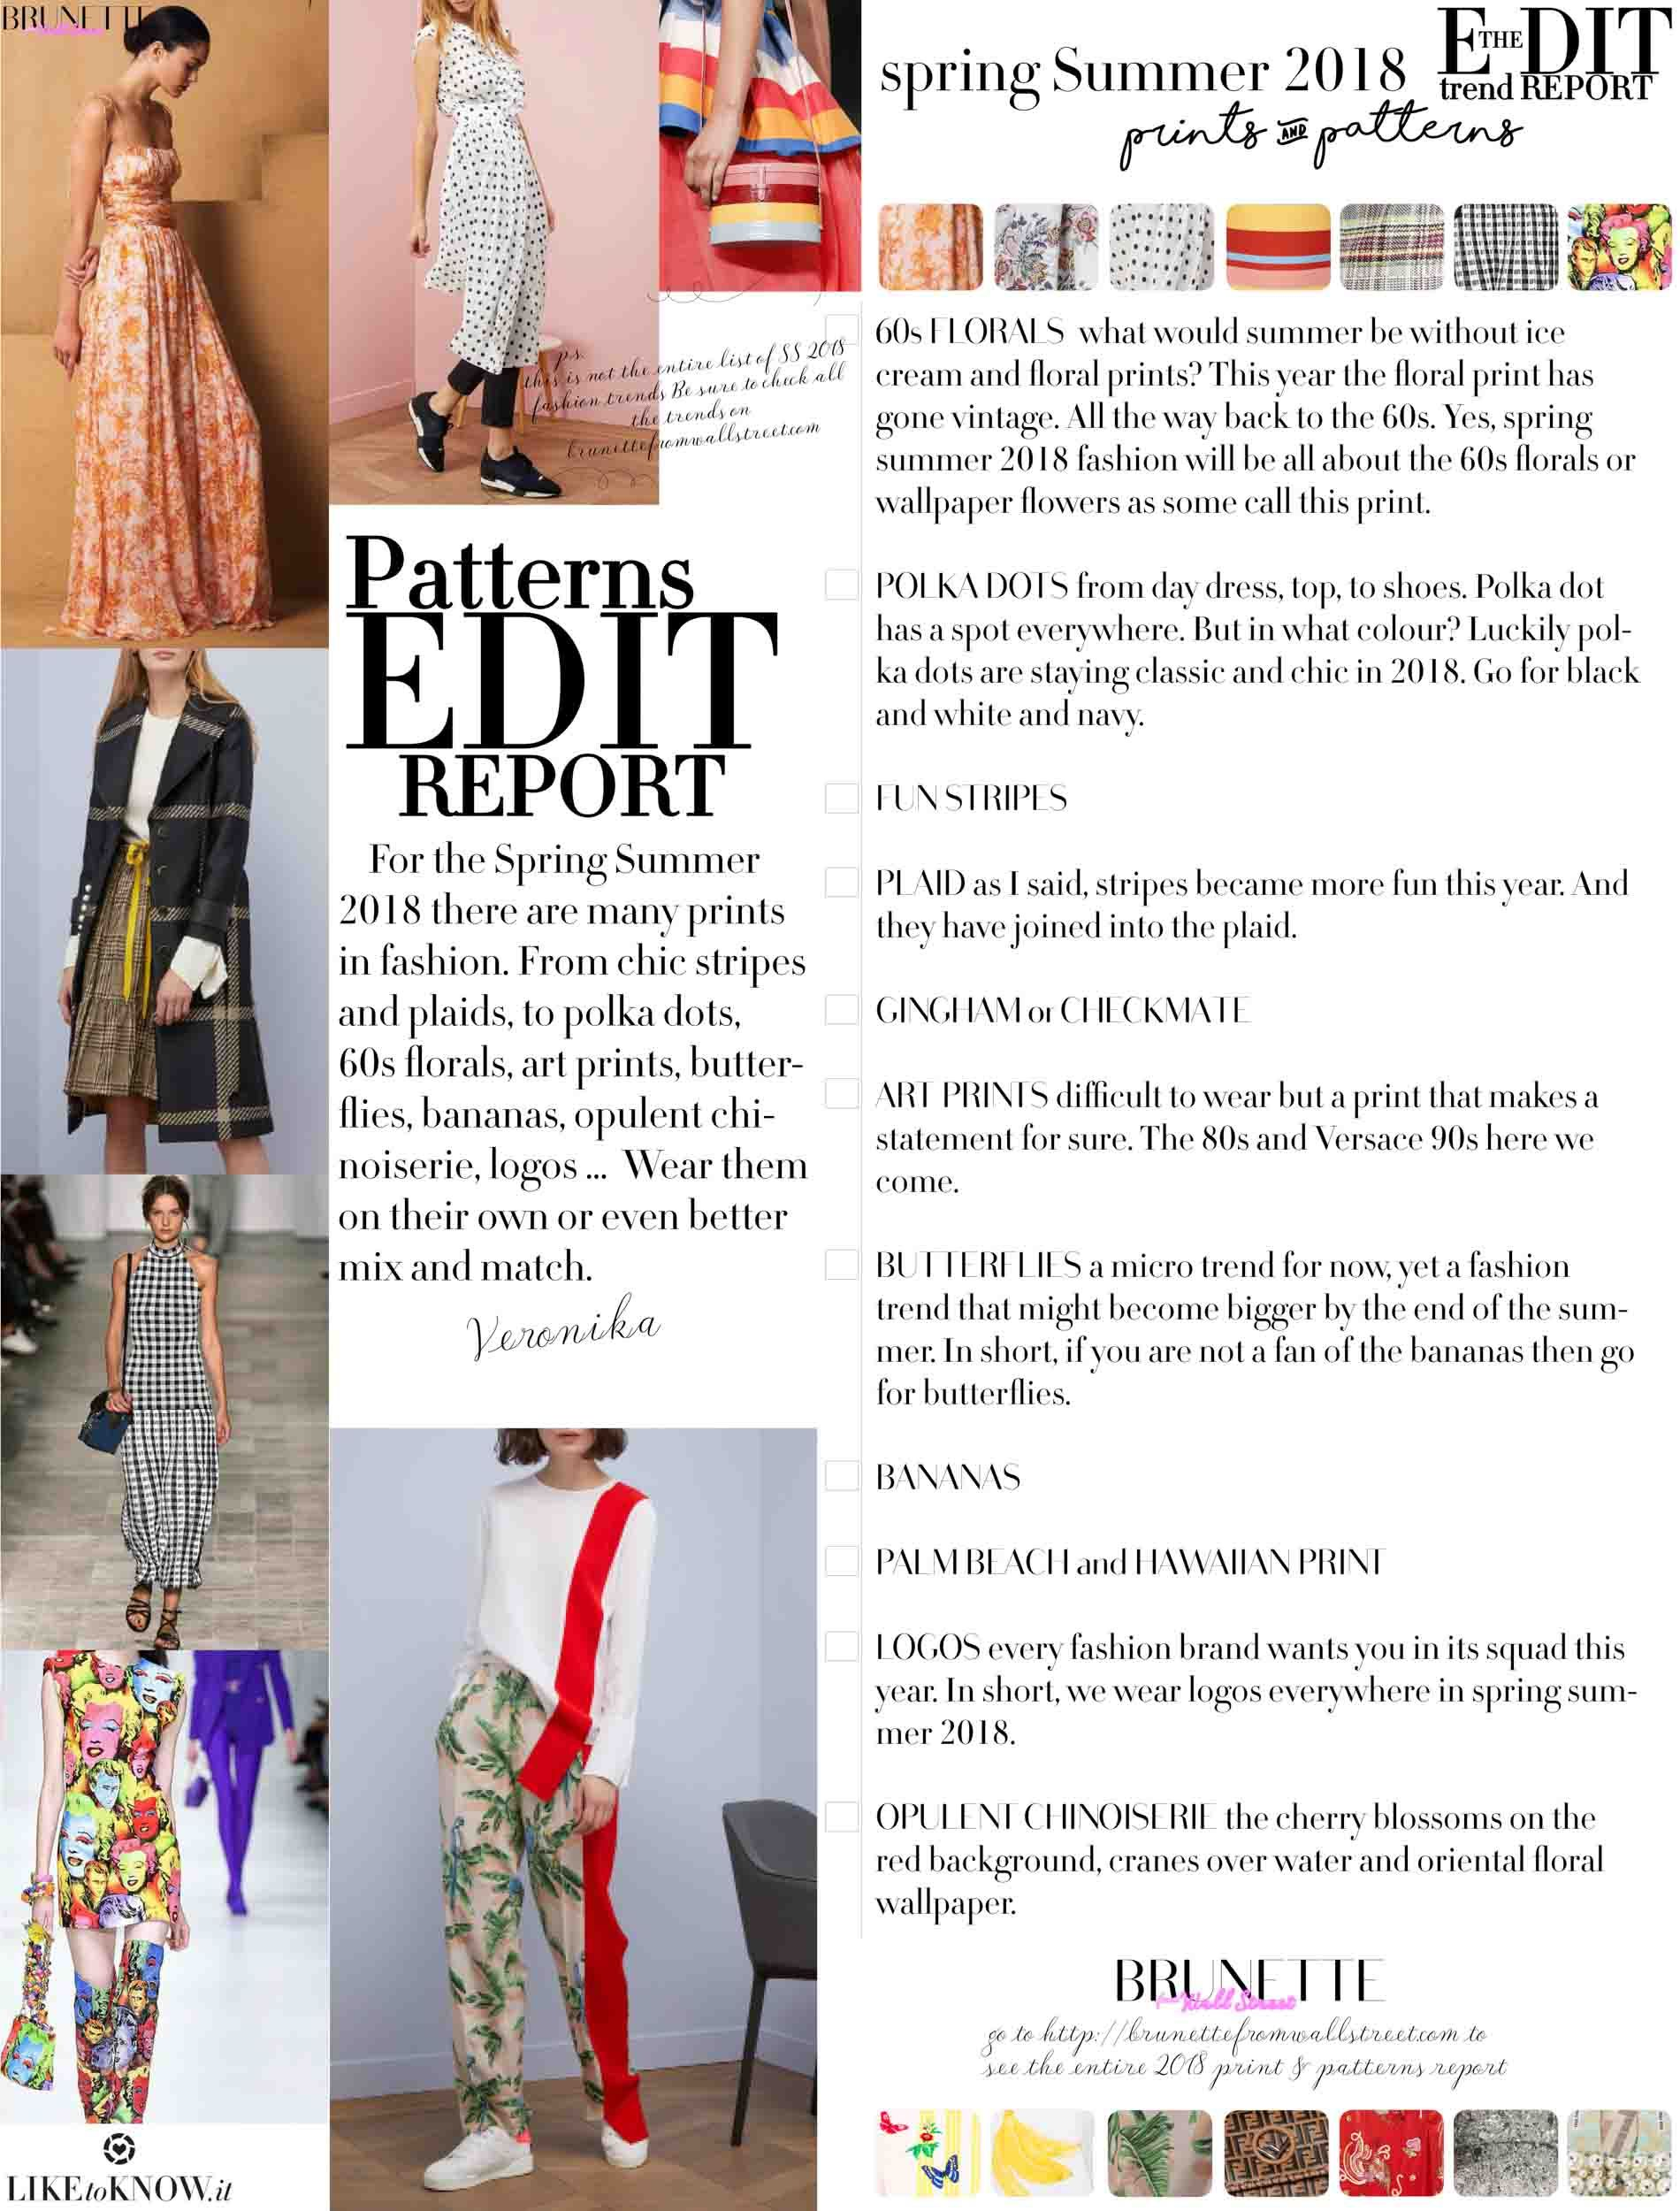 Spring Summer 2018 Fashion Trends Fashion Pinterest Fashion